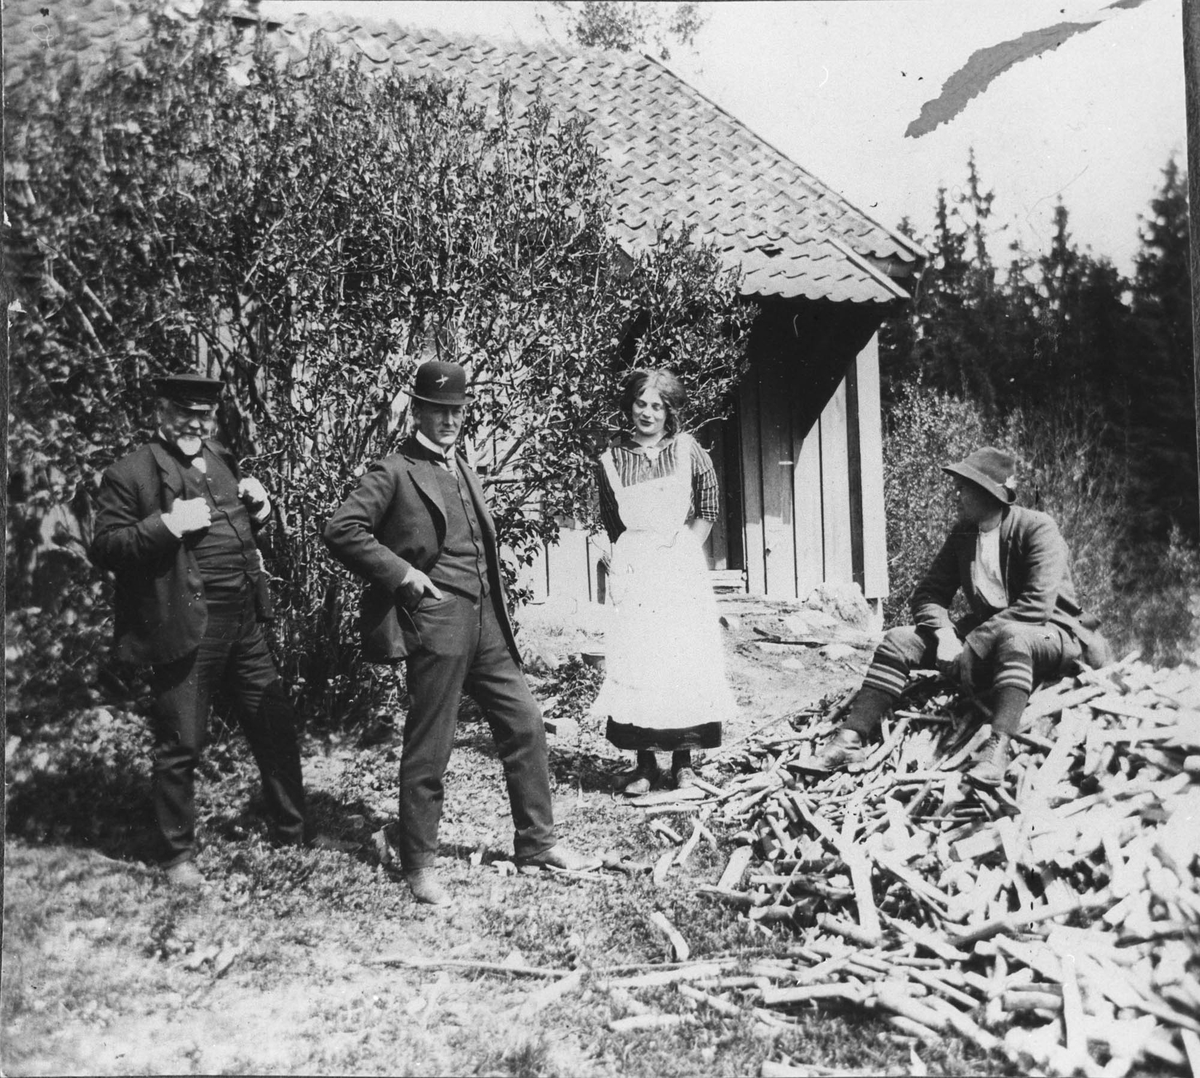 Foran uthuset. Harald Falkenberg til høyre. En sitter på ved haugen.